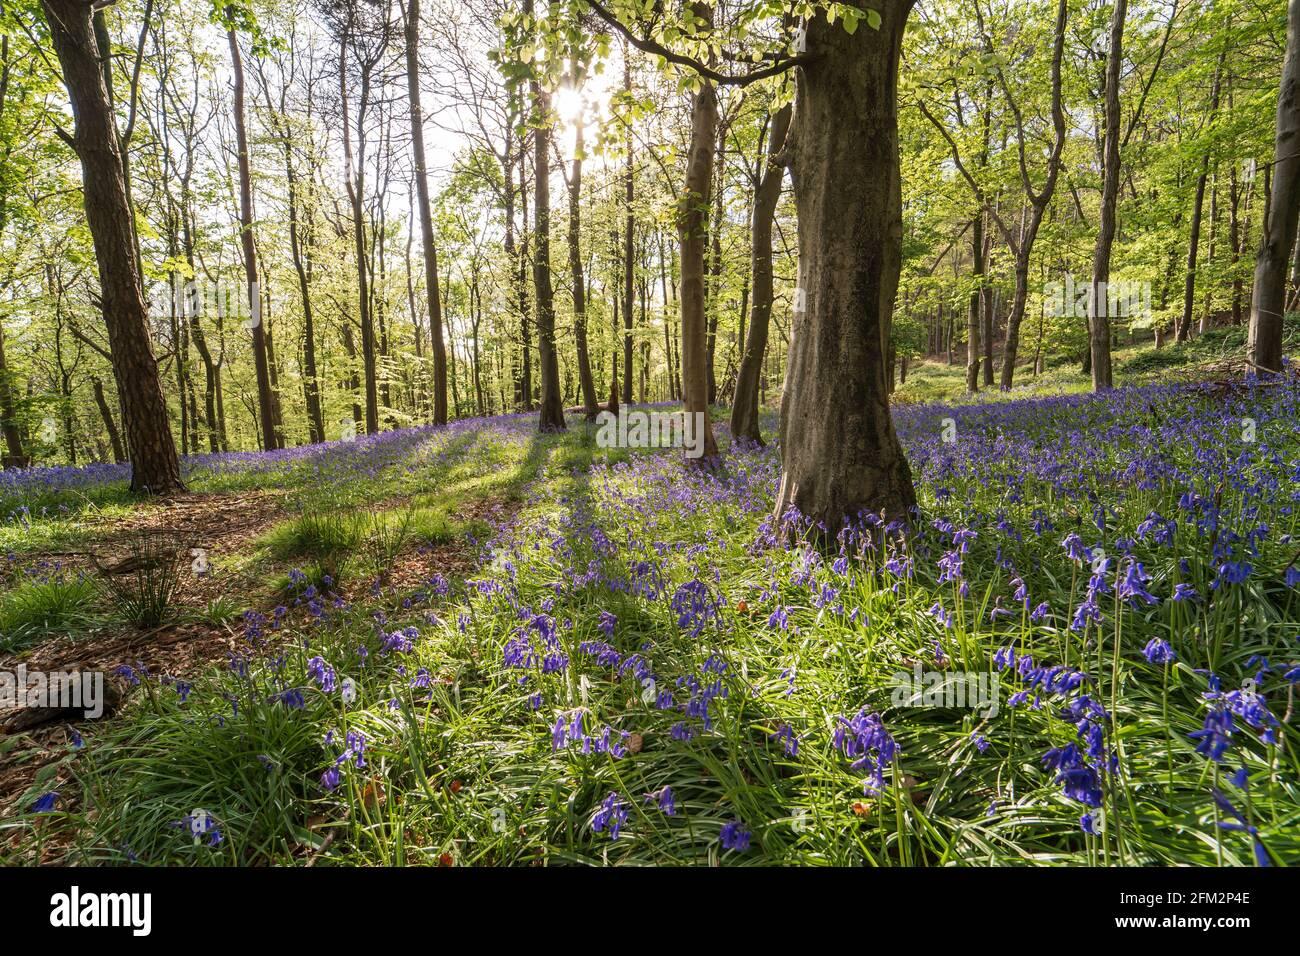 Bluebells en Graig Fawr Woods cerca de Margam Country Park al atardecer, Port Talbot, Gales del Sur, Reino Unido Foto de stock